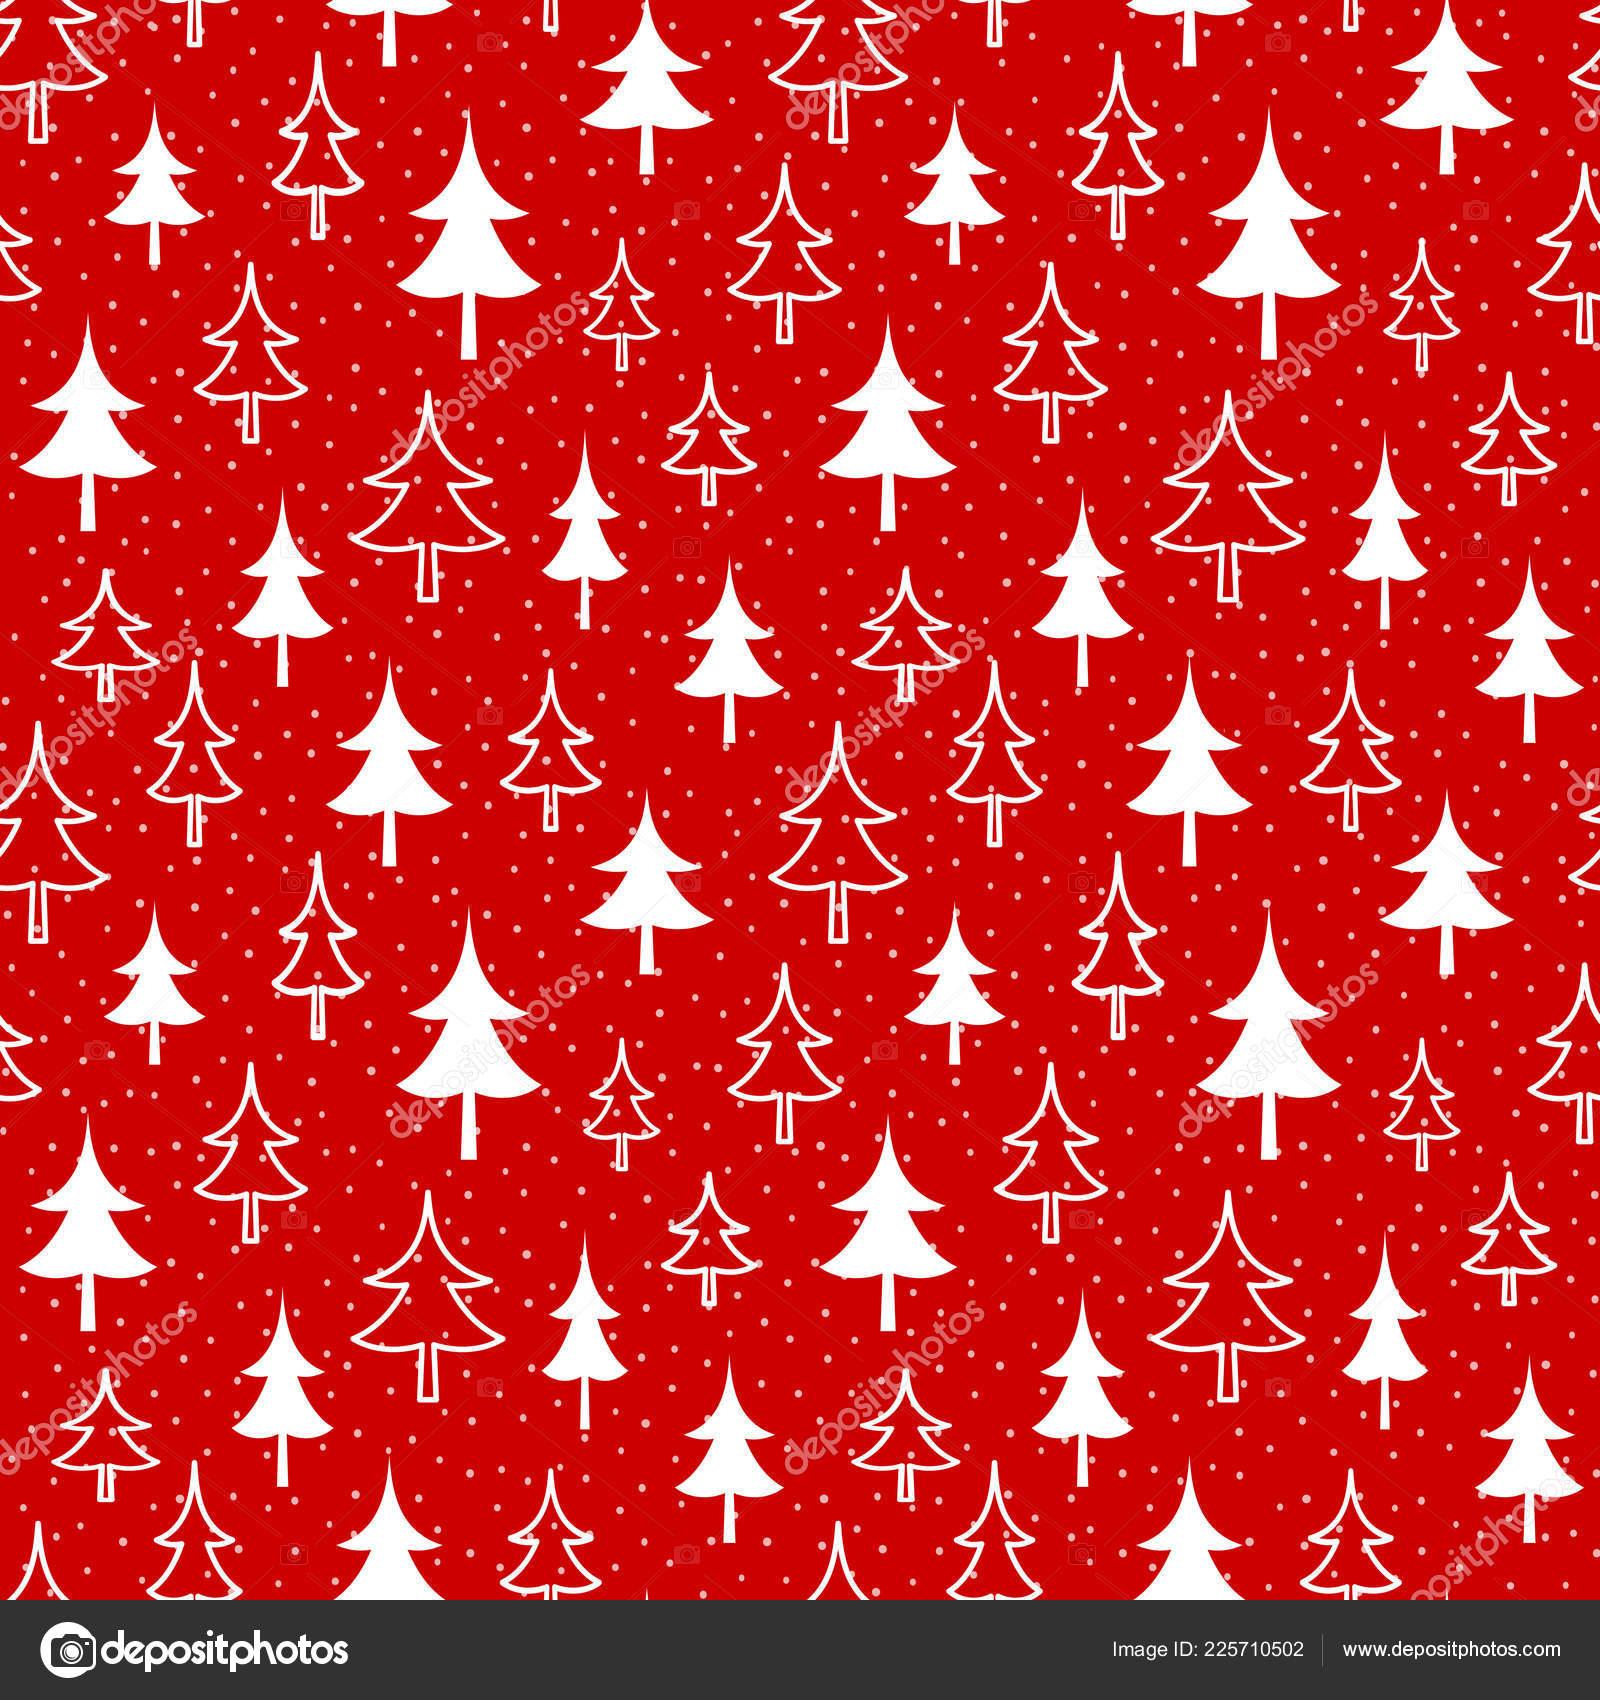 Christmas Seamless Red Pattern White Fir Snow Xmas Endless Texture